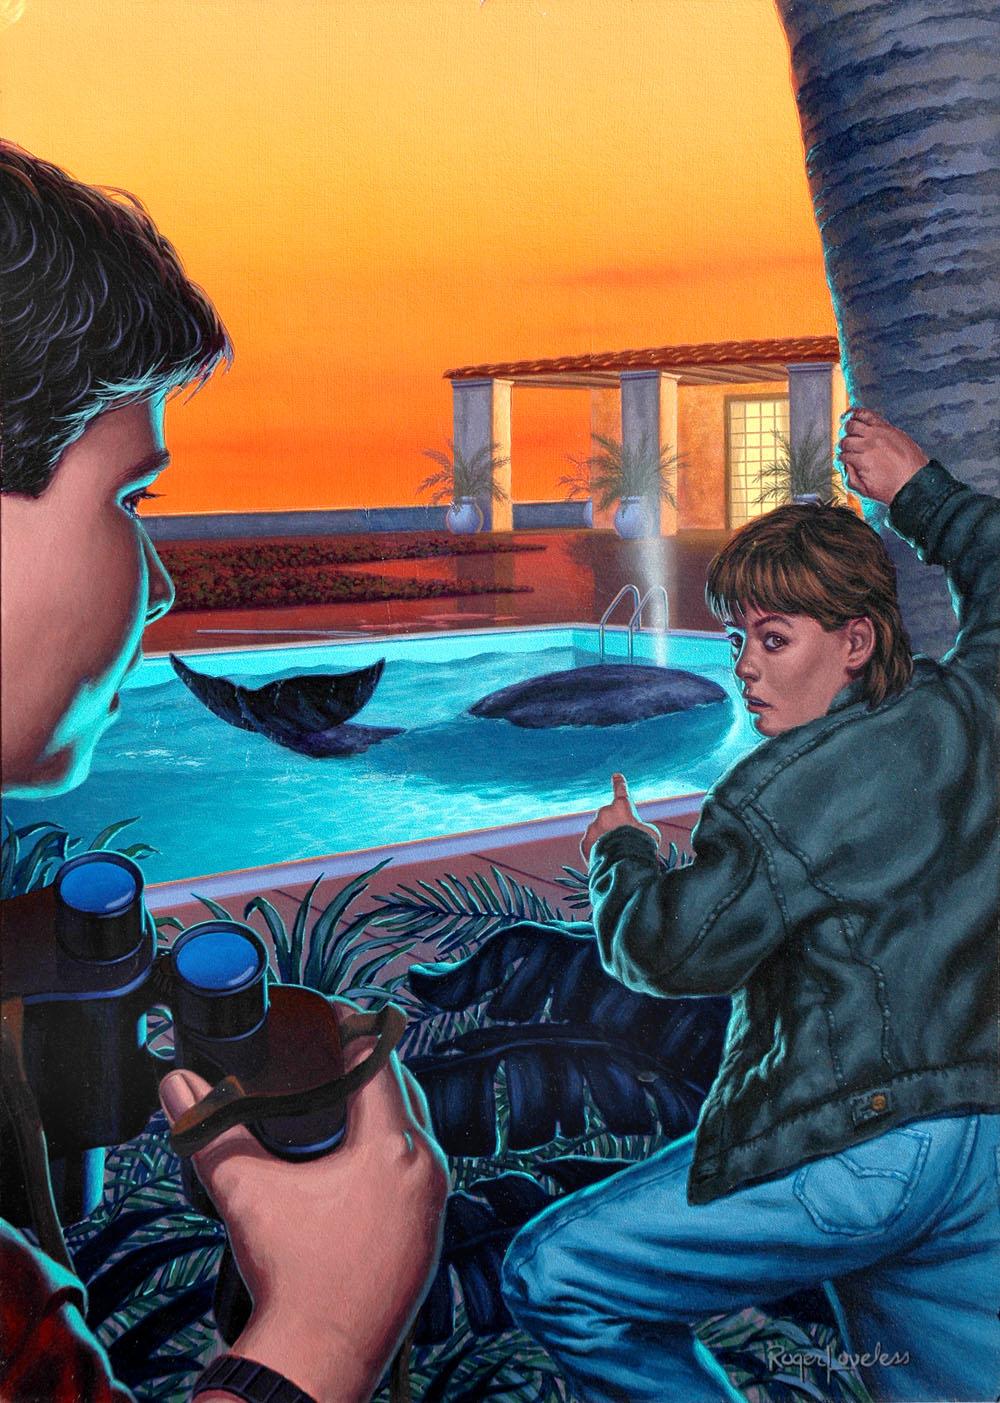 The Three Investigators: The Secret of Skeleton Island No. 6 by Robert Arthur...